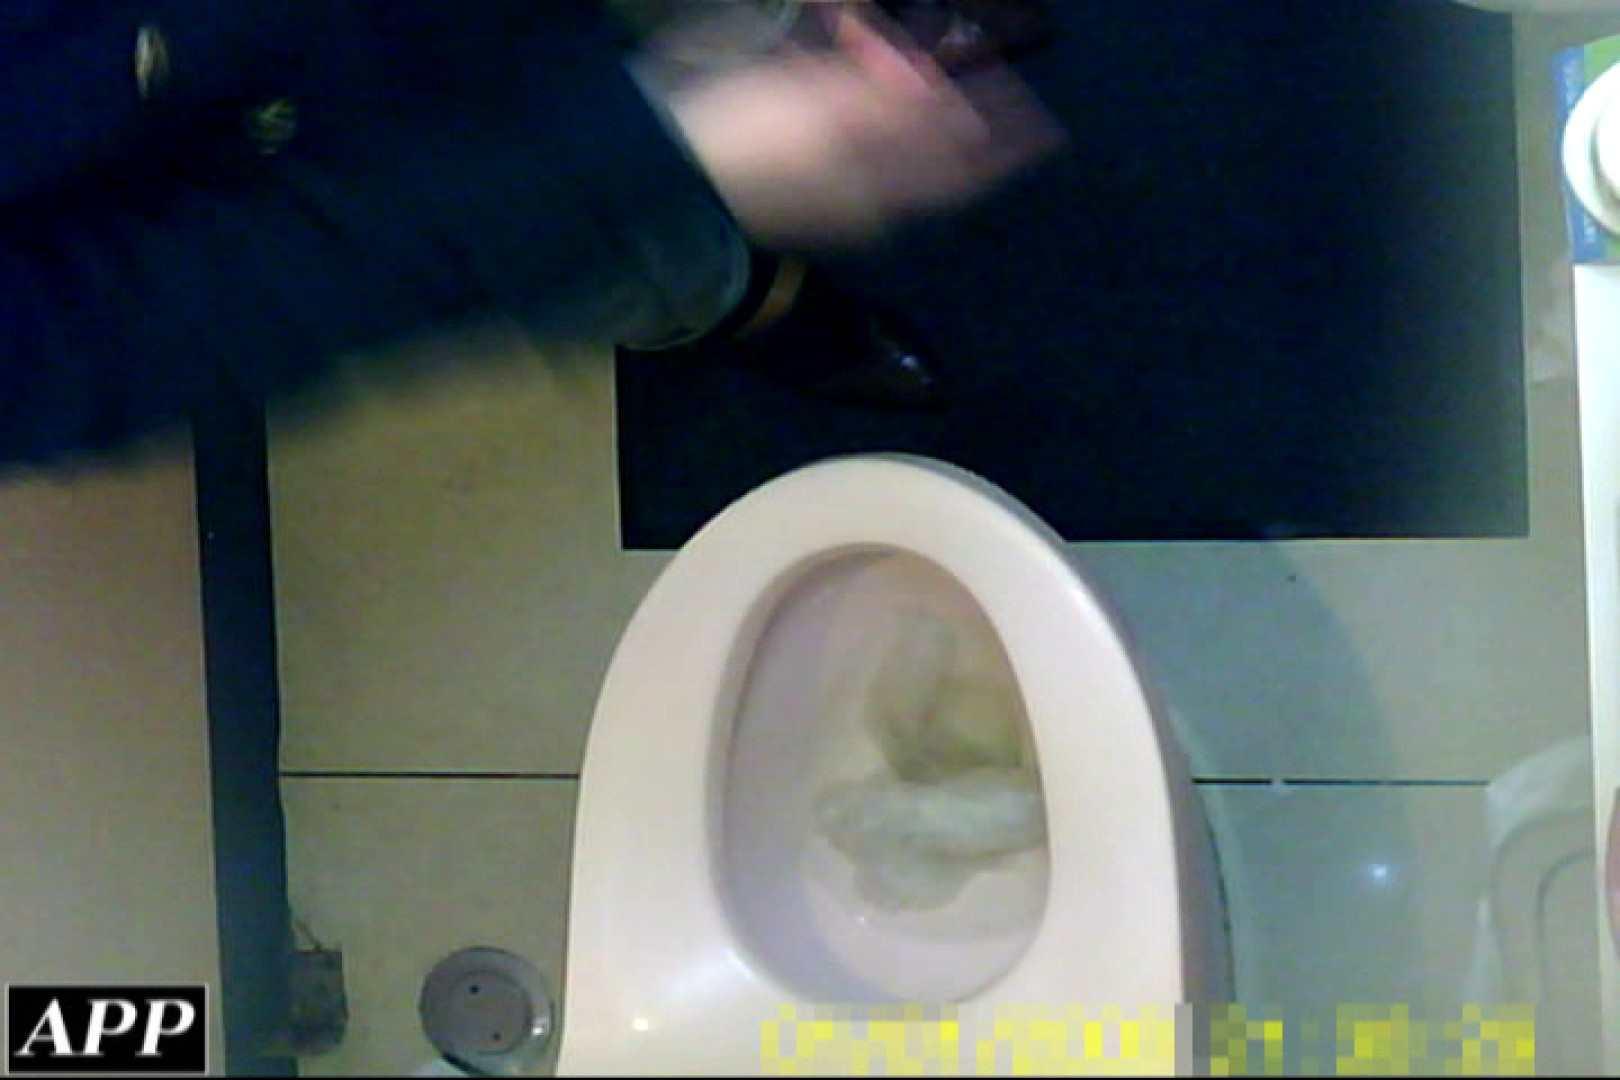 3視点洗面所 vol.087 OLエロ画像  83PICs 66